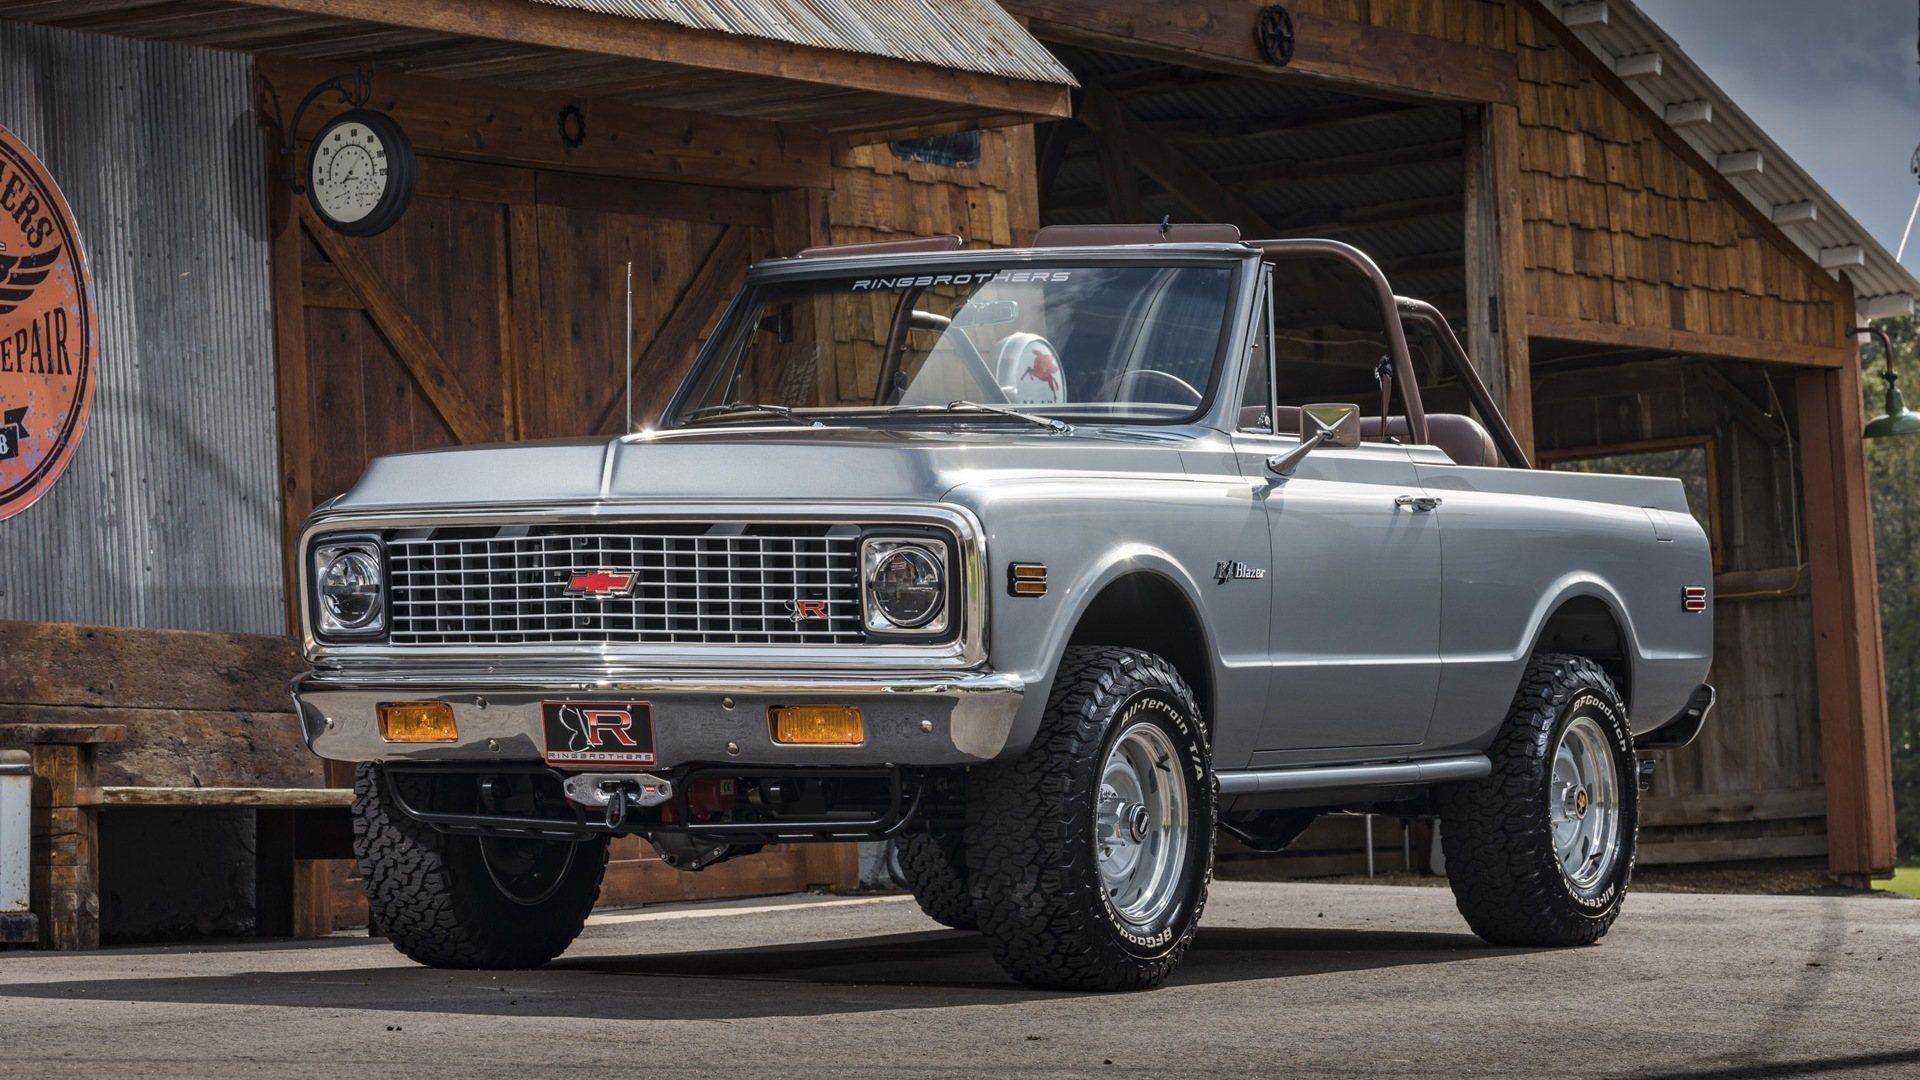 2021 Chevrolet Blazer K-5 Release Date in 2020 | Chevrolet ...